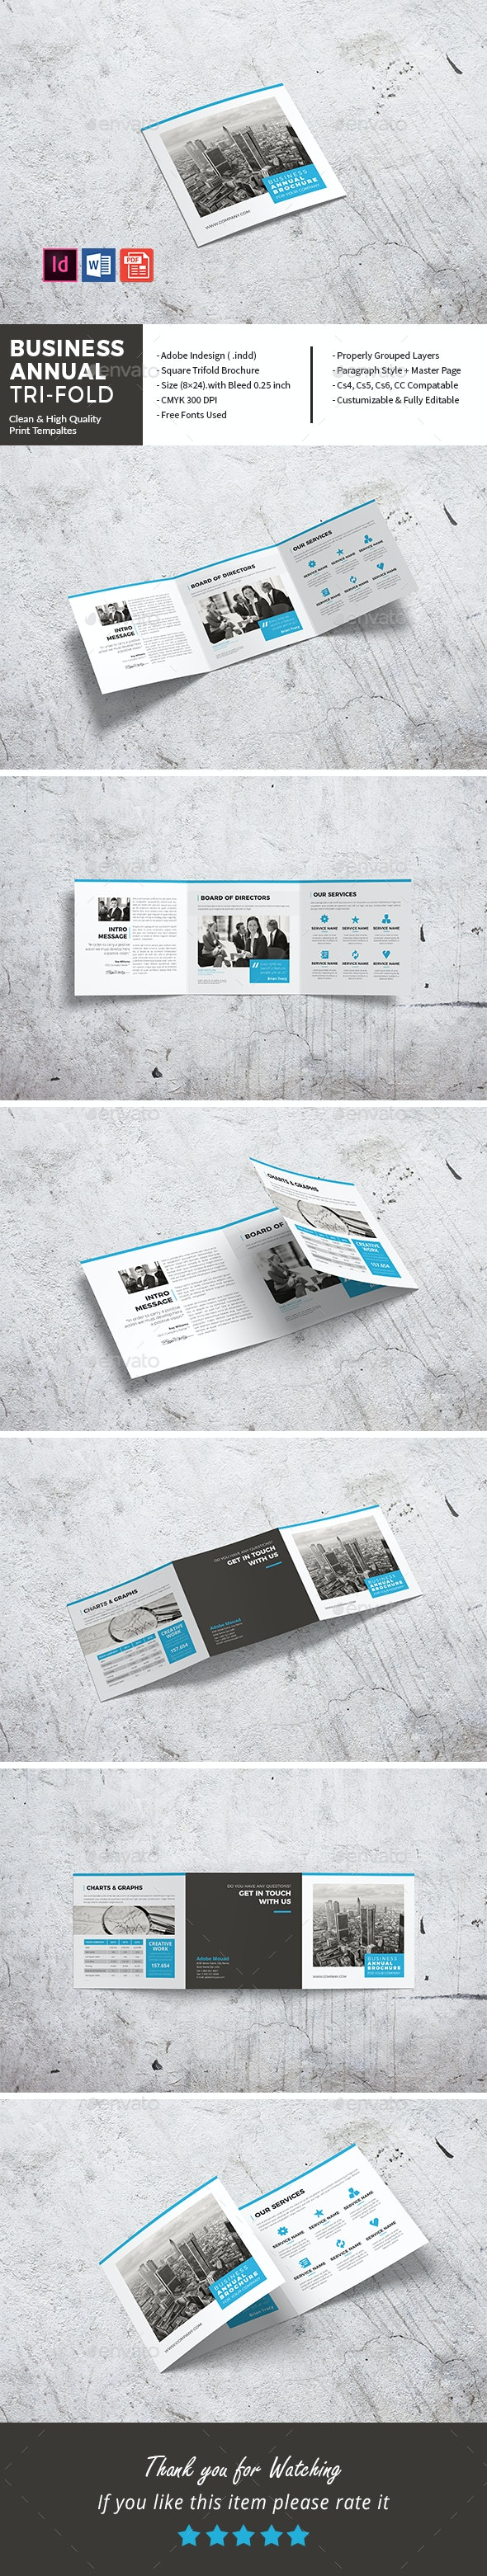 Square Business Annual Tri-Fold - Corporate Brochures